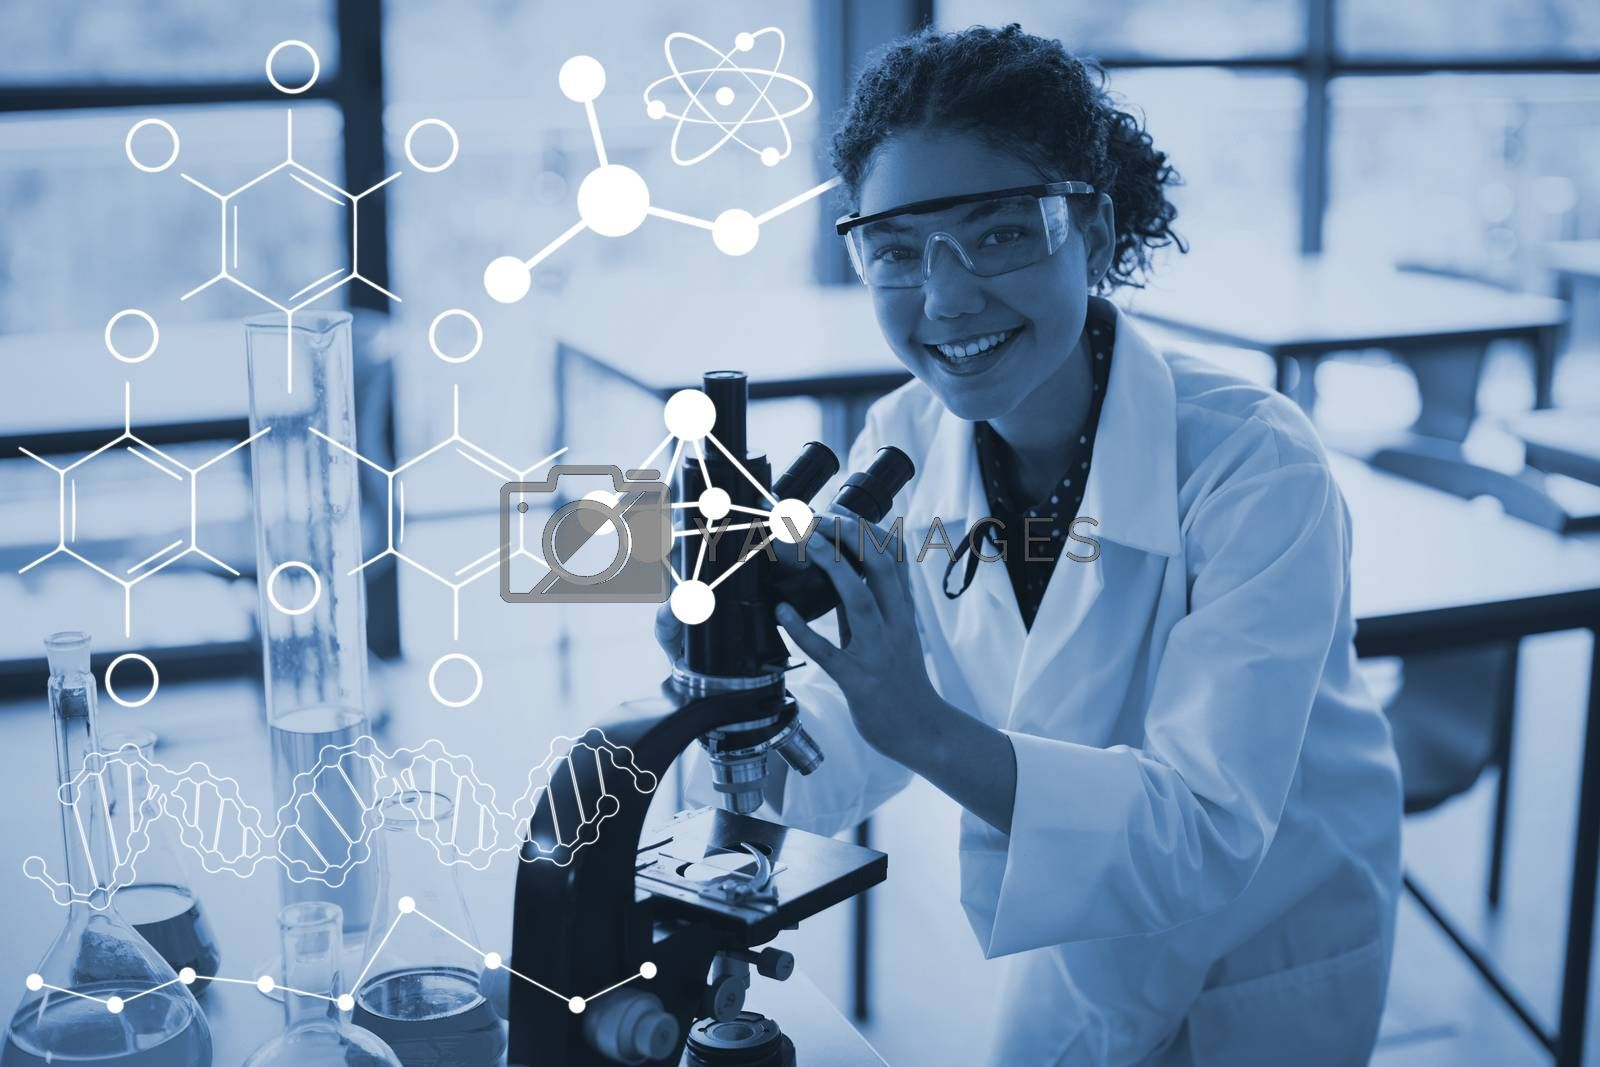 Composite image of illustration of chemical formulas by Wavebreakmedia